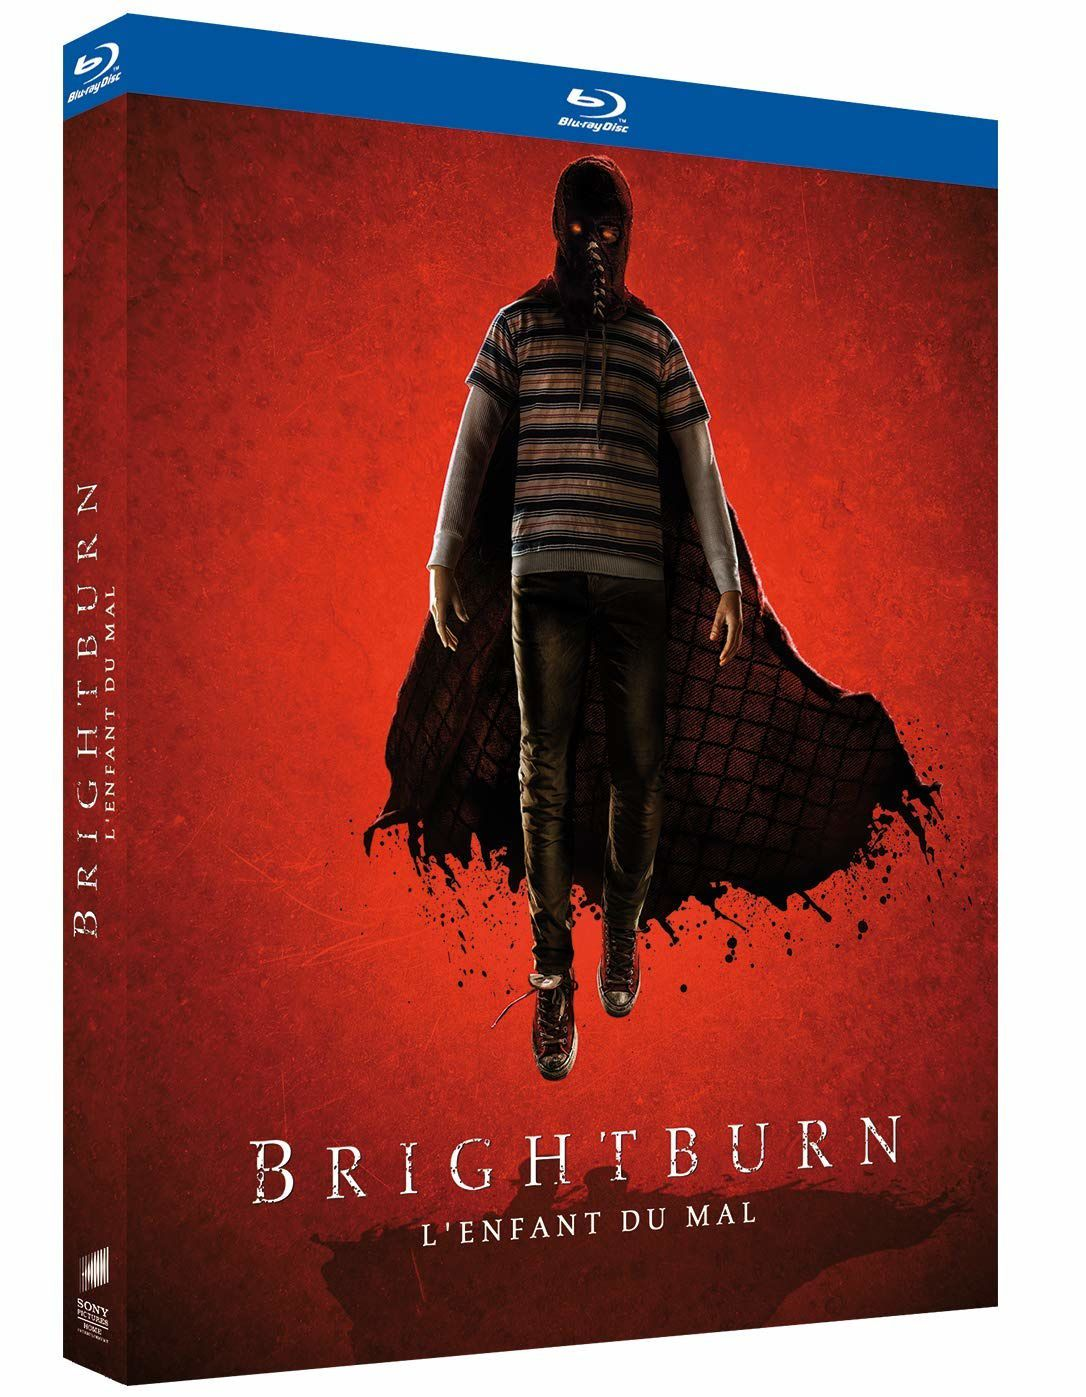 [REVUE CINEMA BLU-RAY] BRIGHTBURN - L'enfant du mal